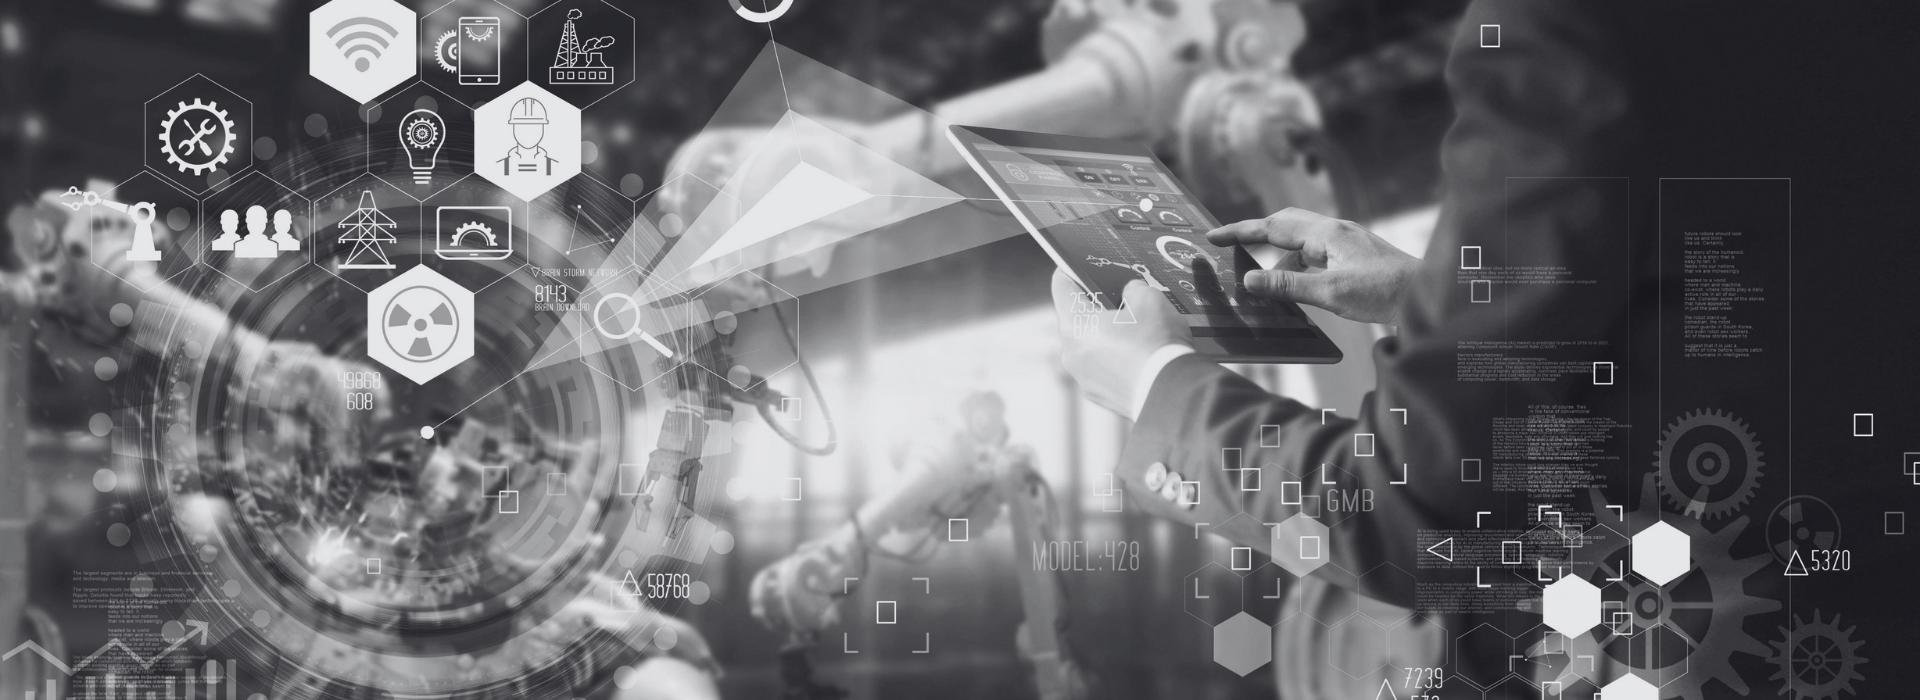 Fundación Paraguaya incorporates artificial intelligence to its digital transformation process